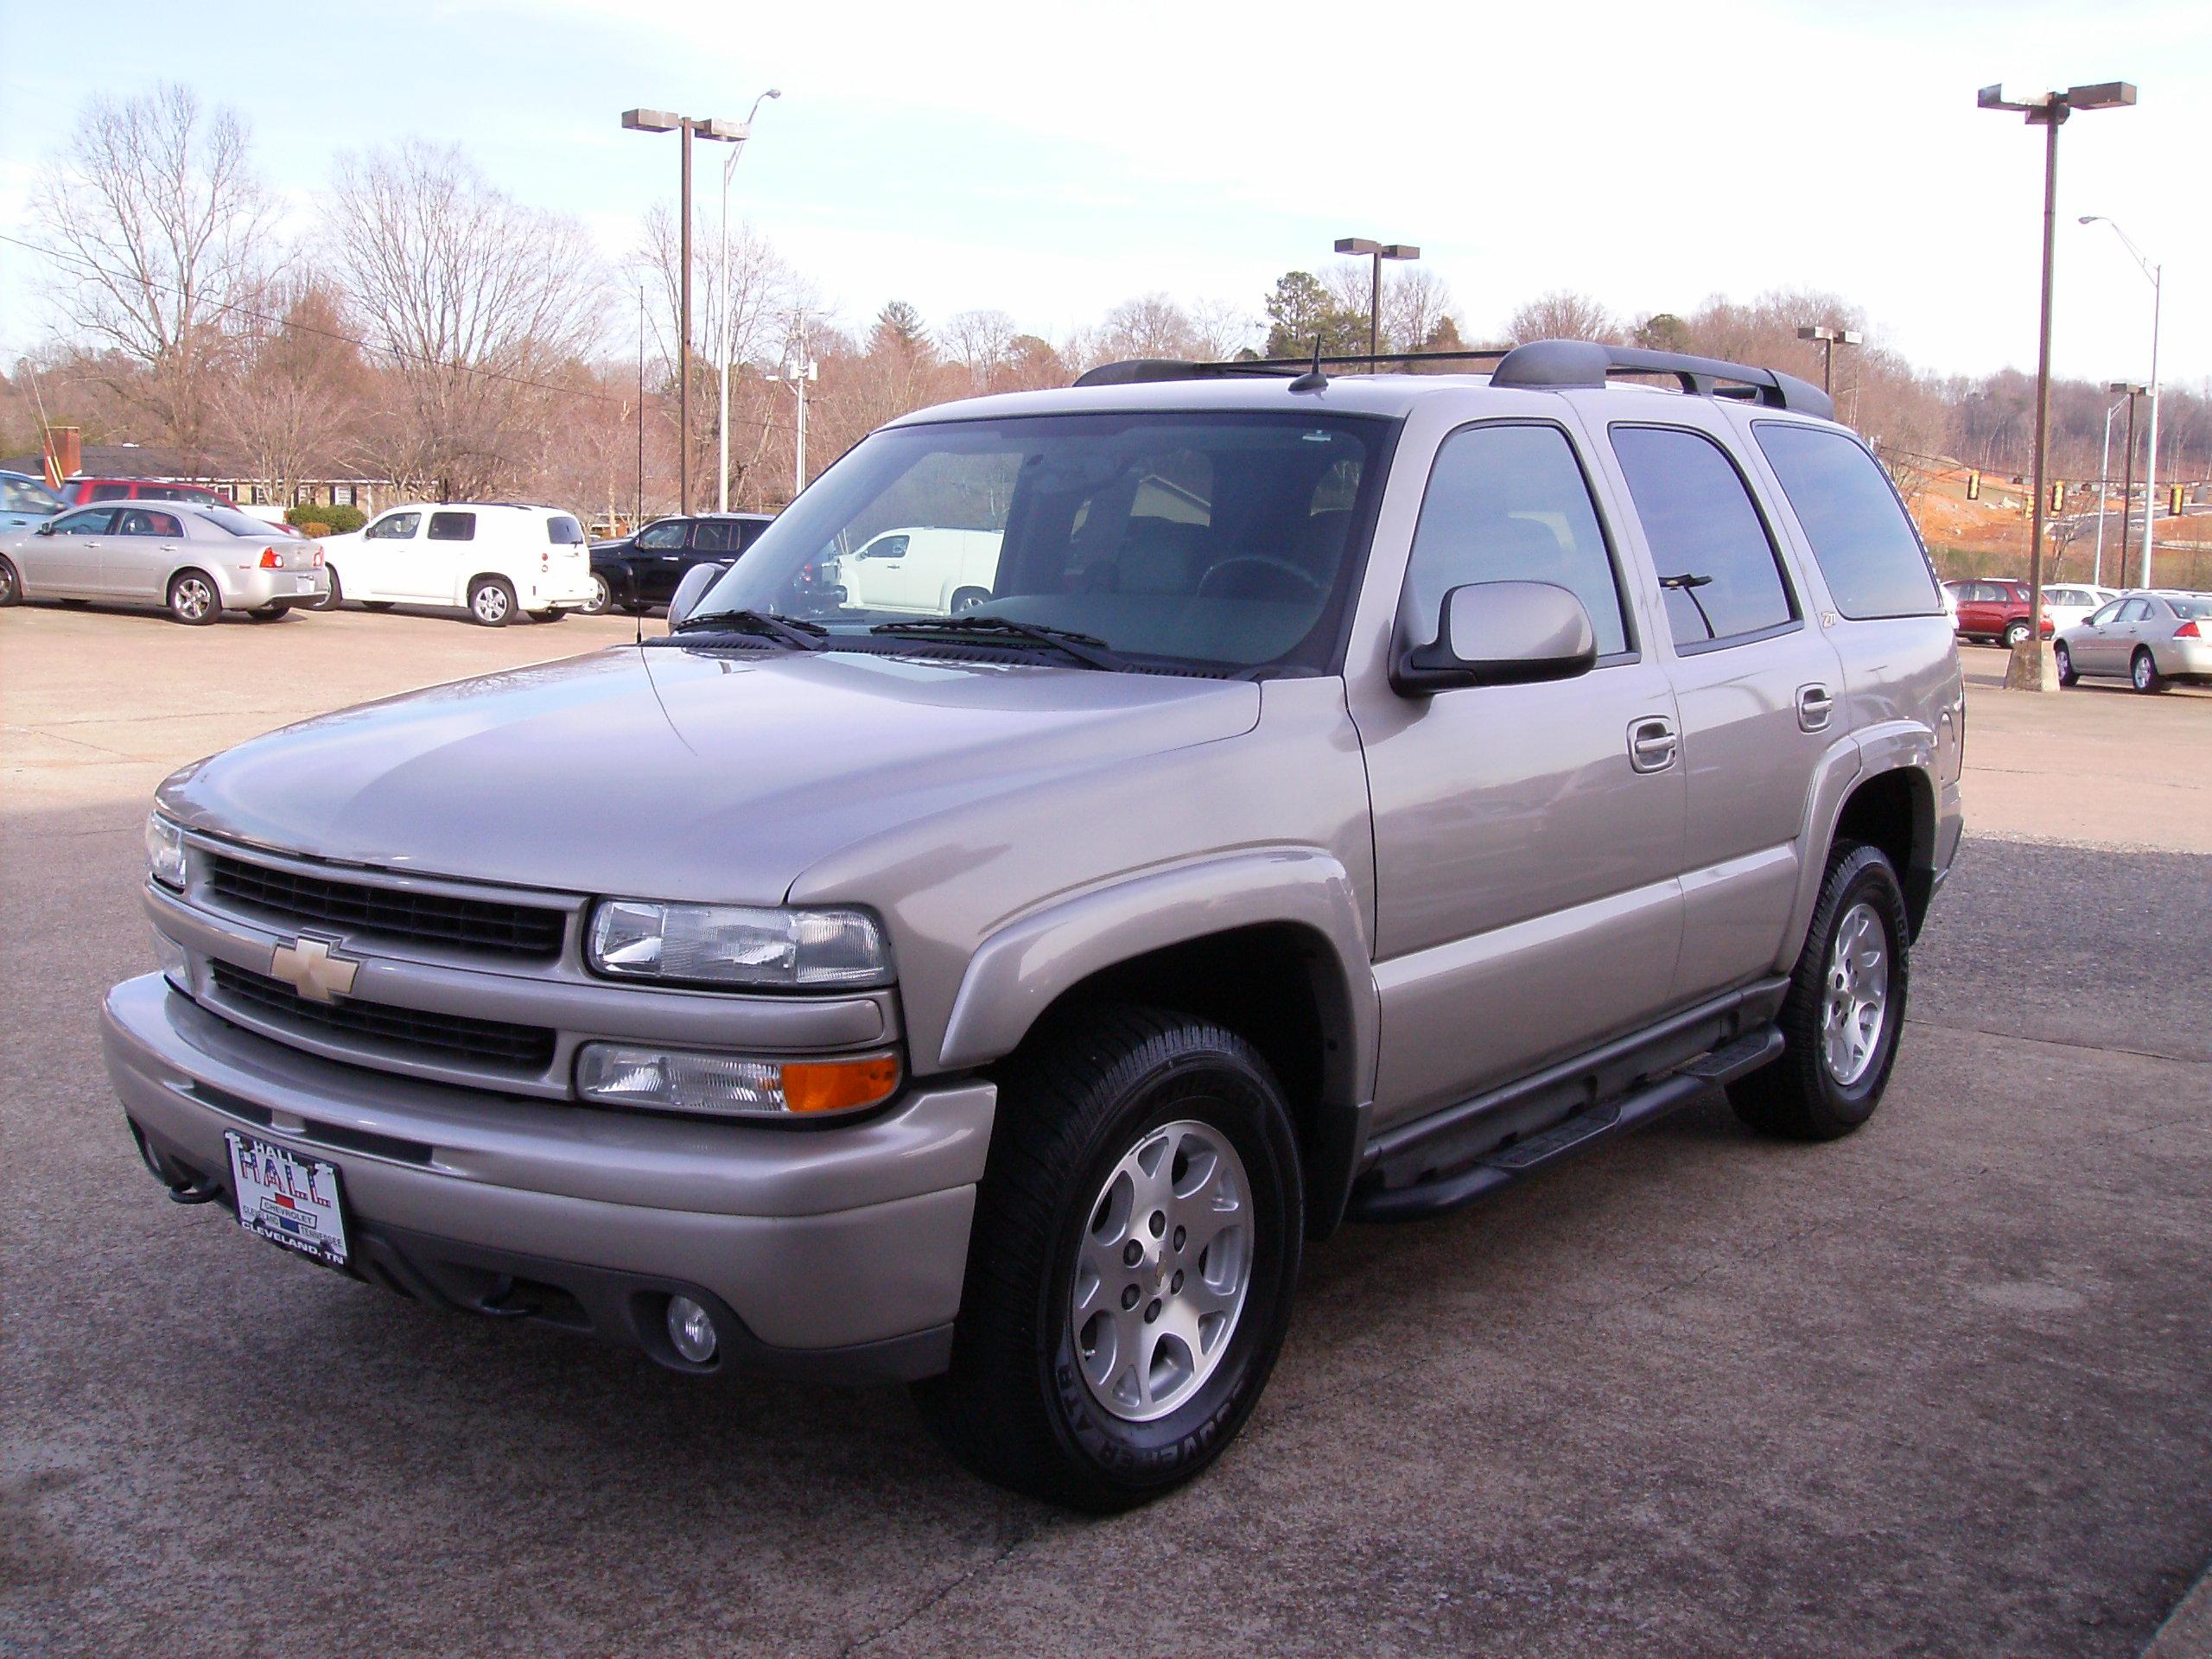 Chevrolet Tahoe 2004 foto - 1